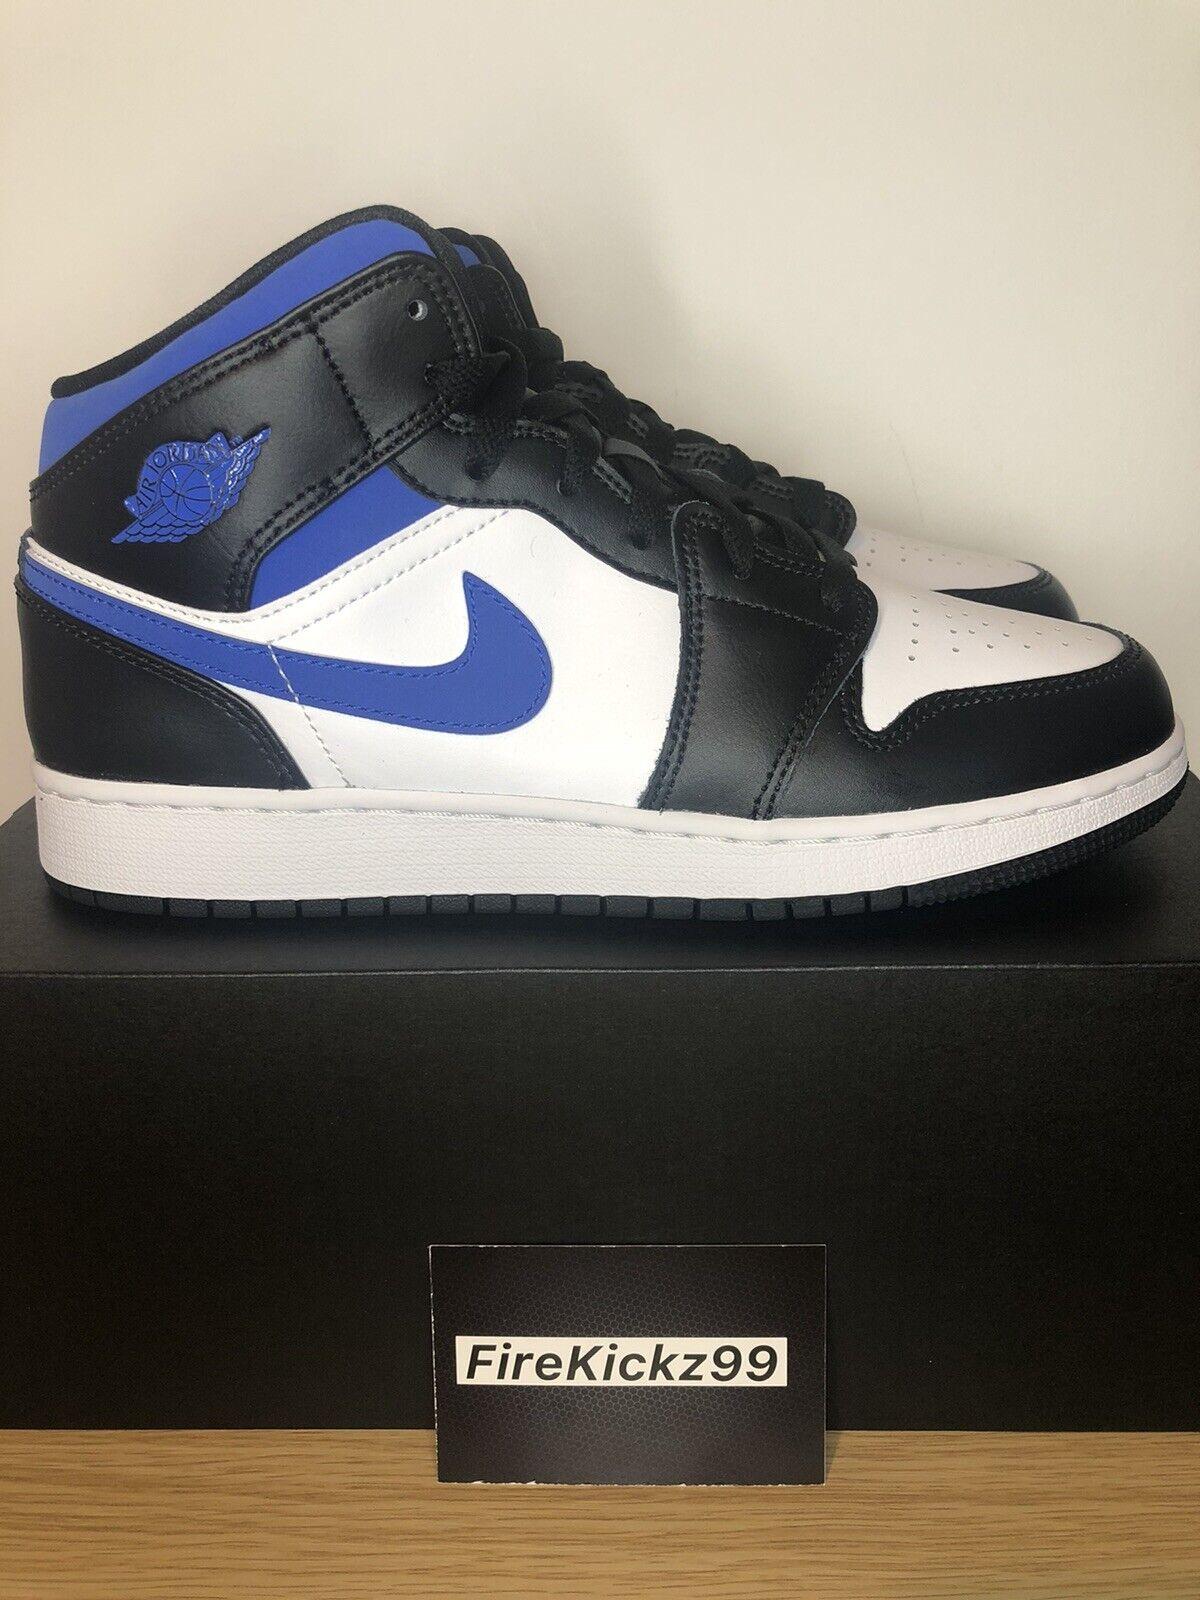 Nike Air Jordan 1 Mid White Royal Racer Blue Black GS Size UK 5.5 / US 6Y (5)